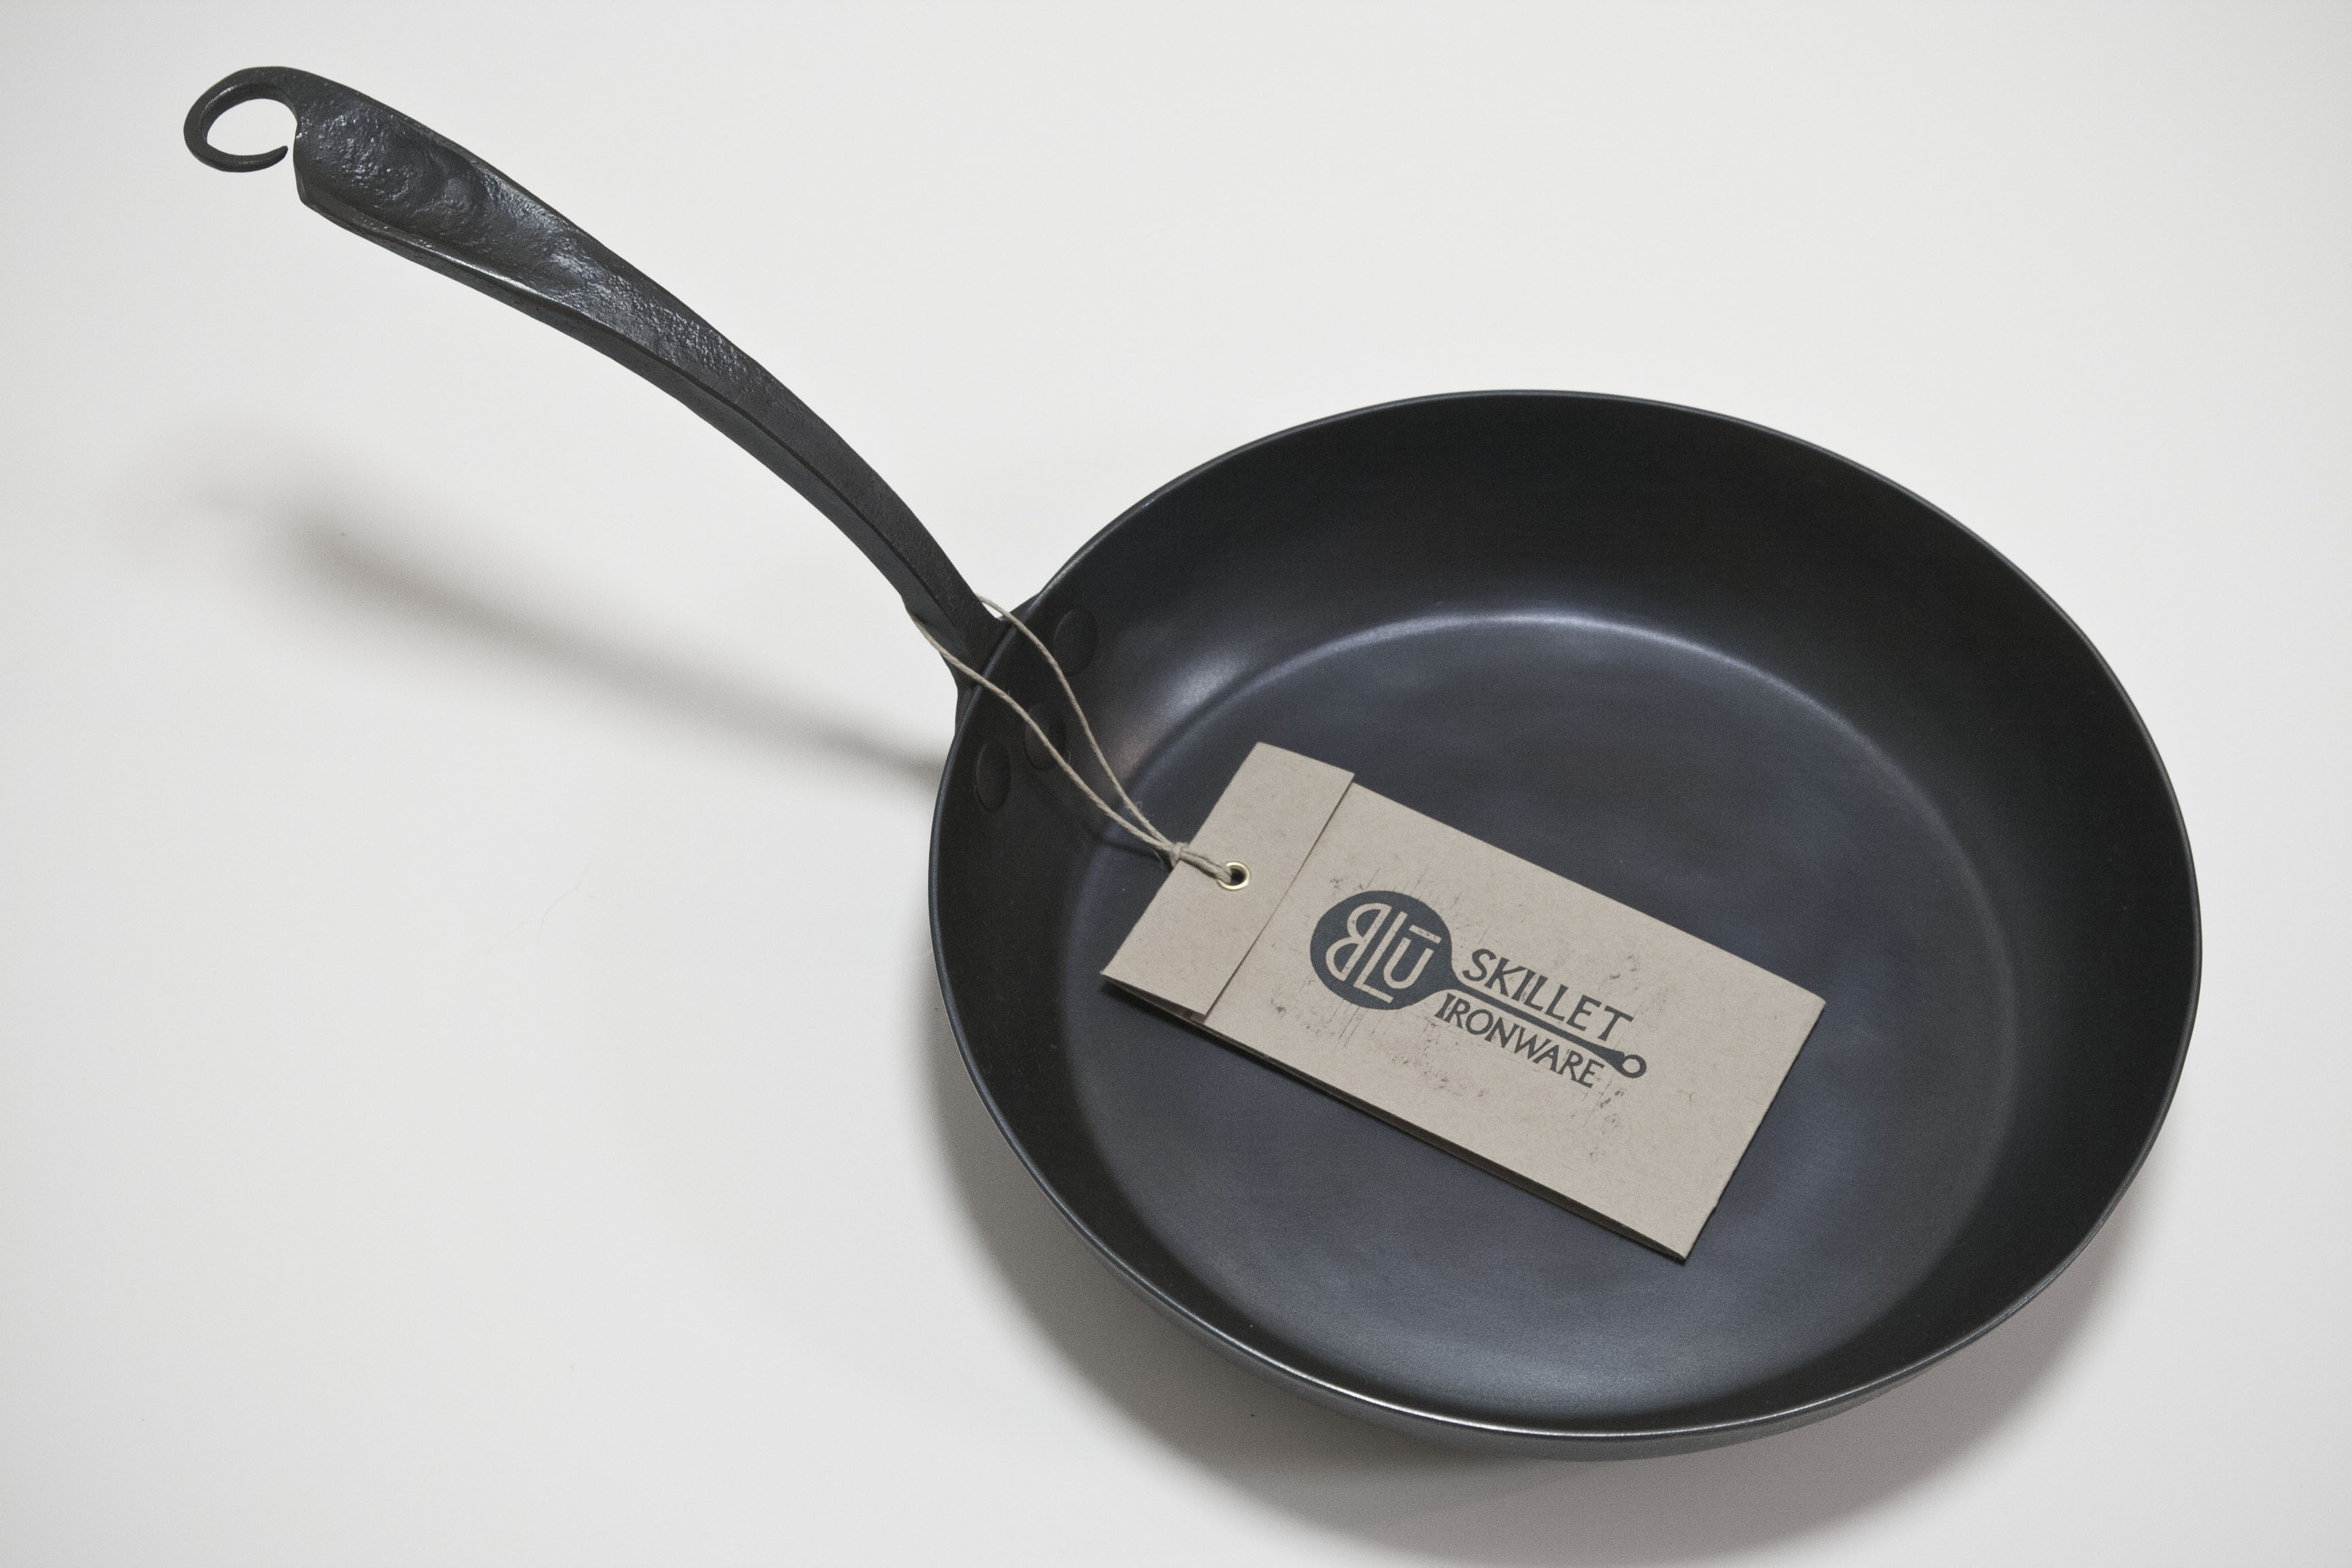 "Blu Skillet Ironware 10"" French Skillet"